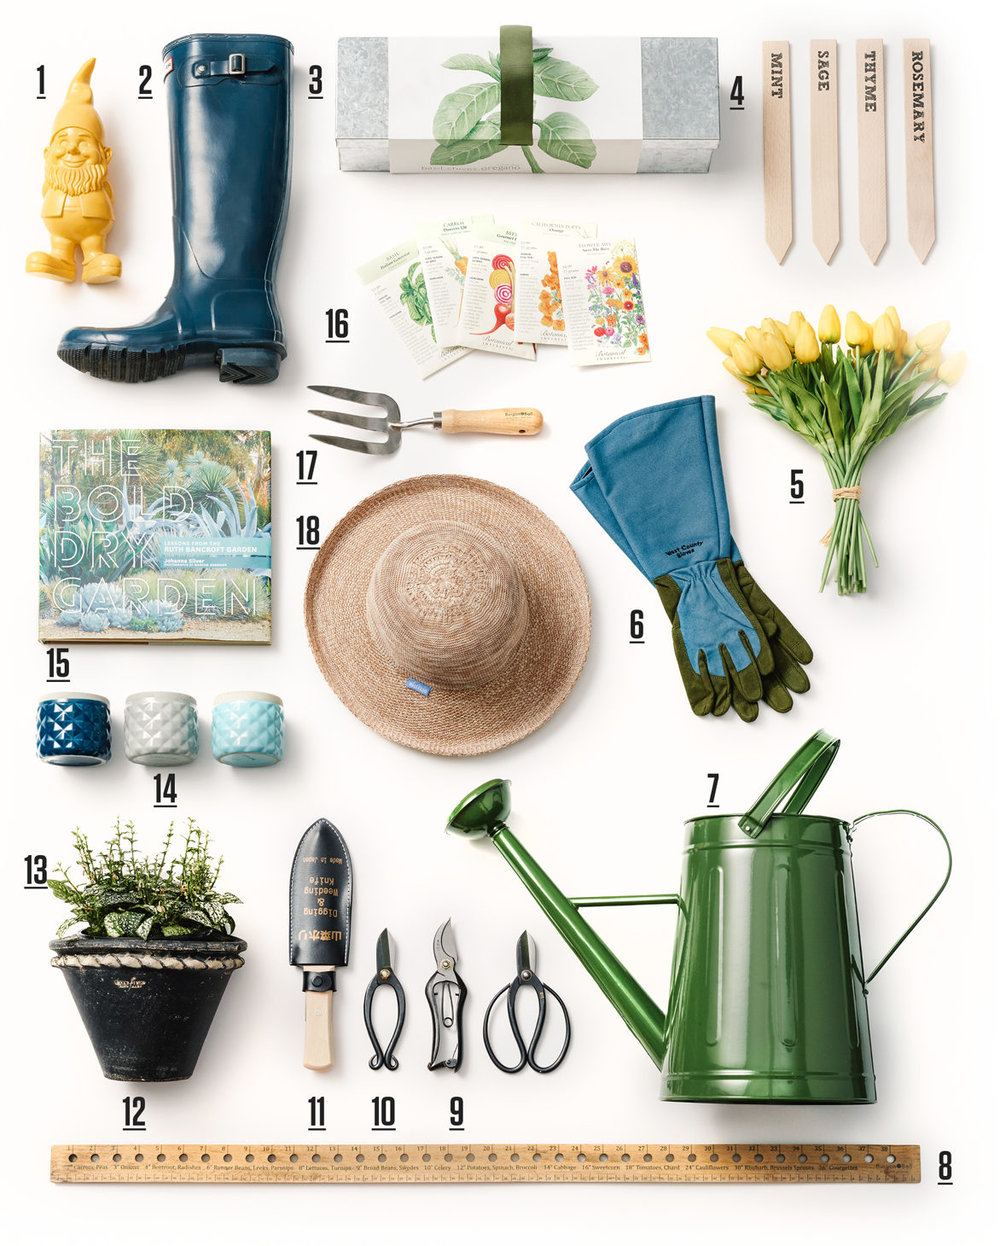 Garden Gear We Love ( 5280 Home)